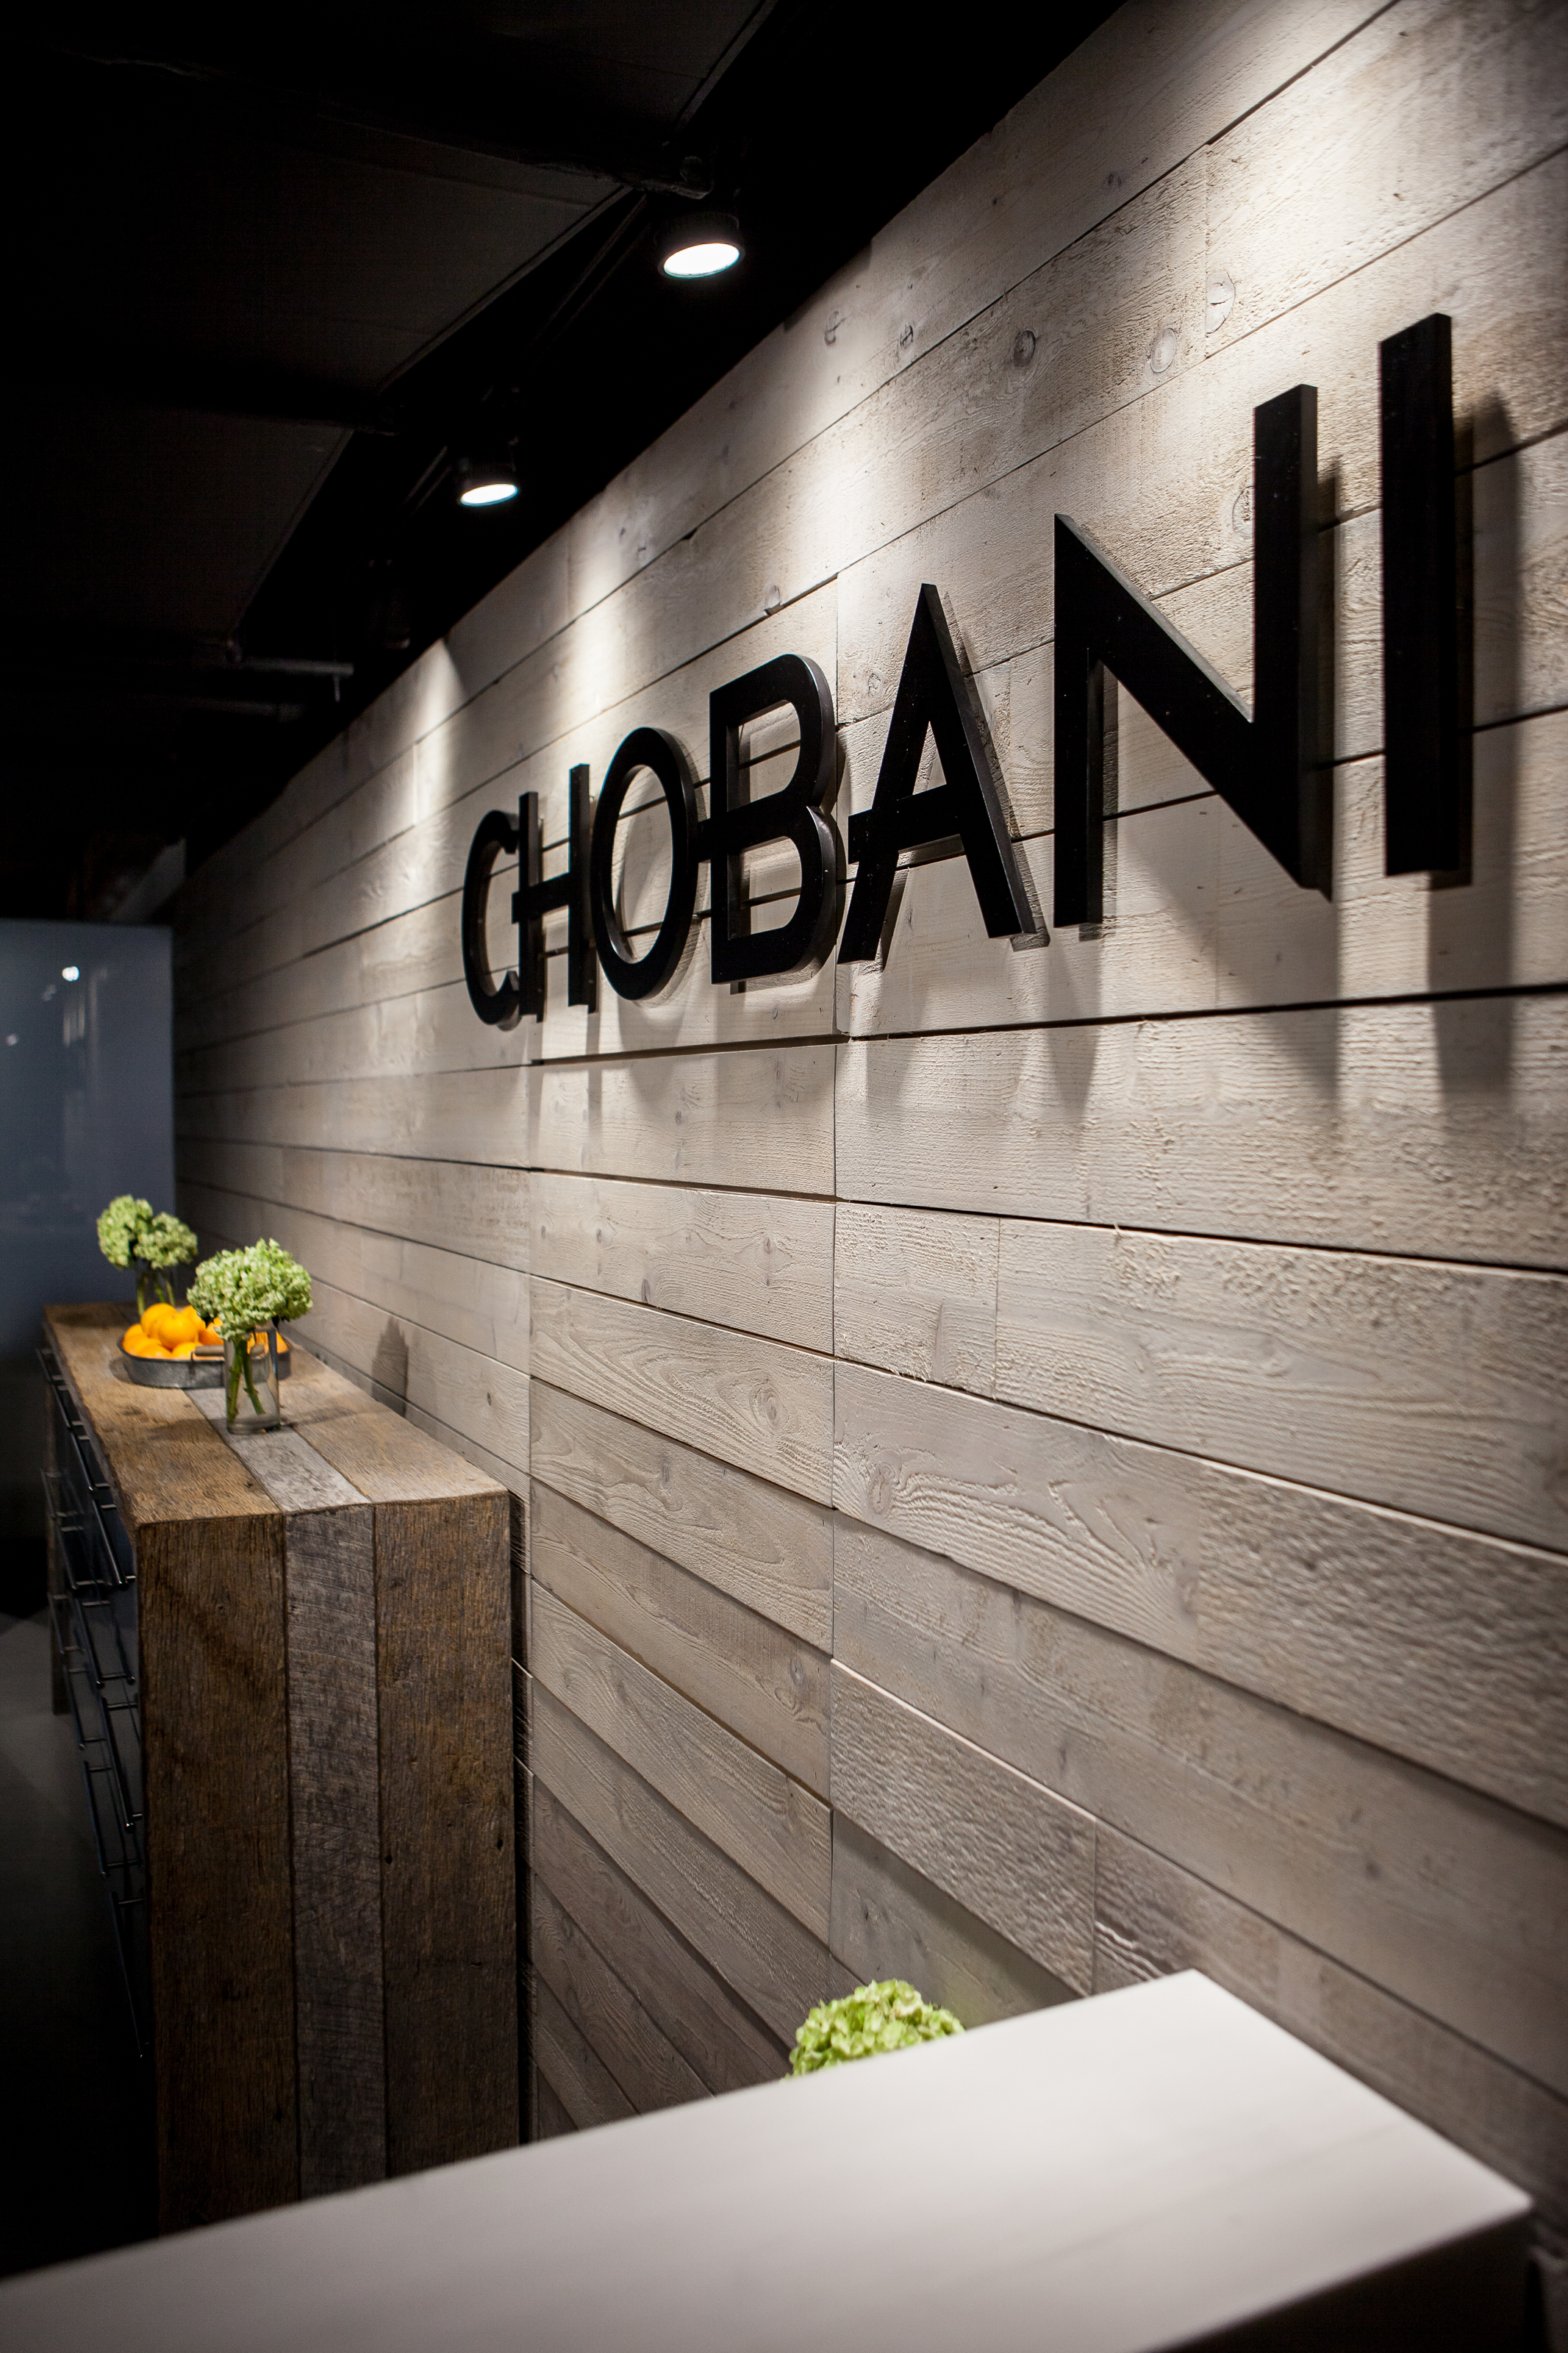 200 Lafayette Street - New York CityChobani Corporate Headquarters